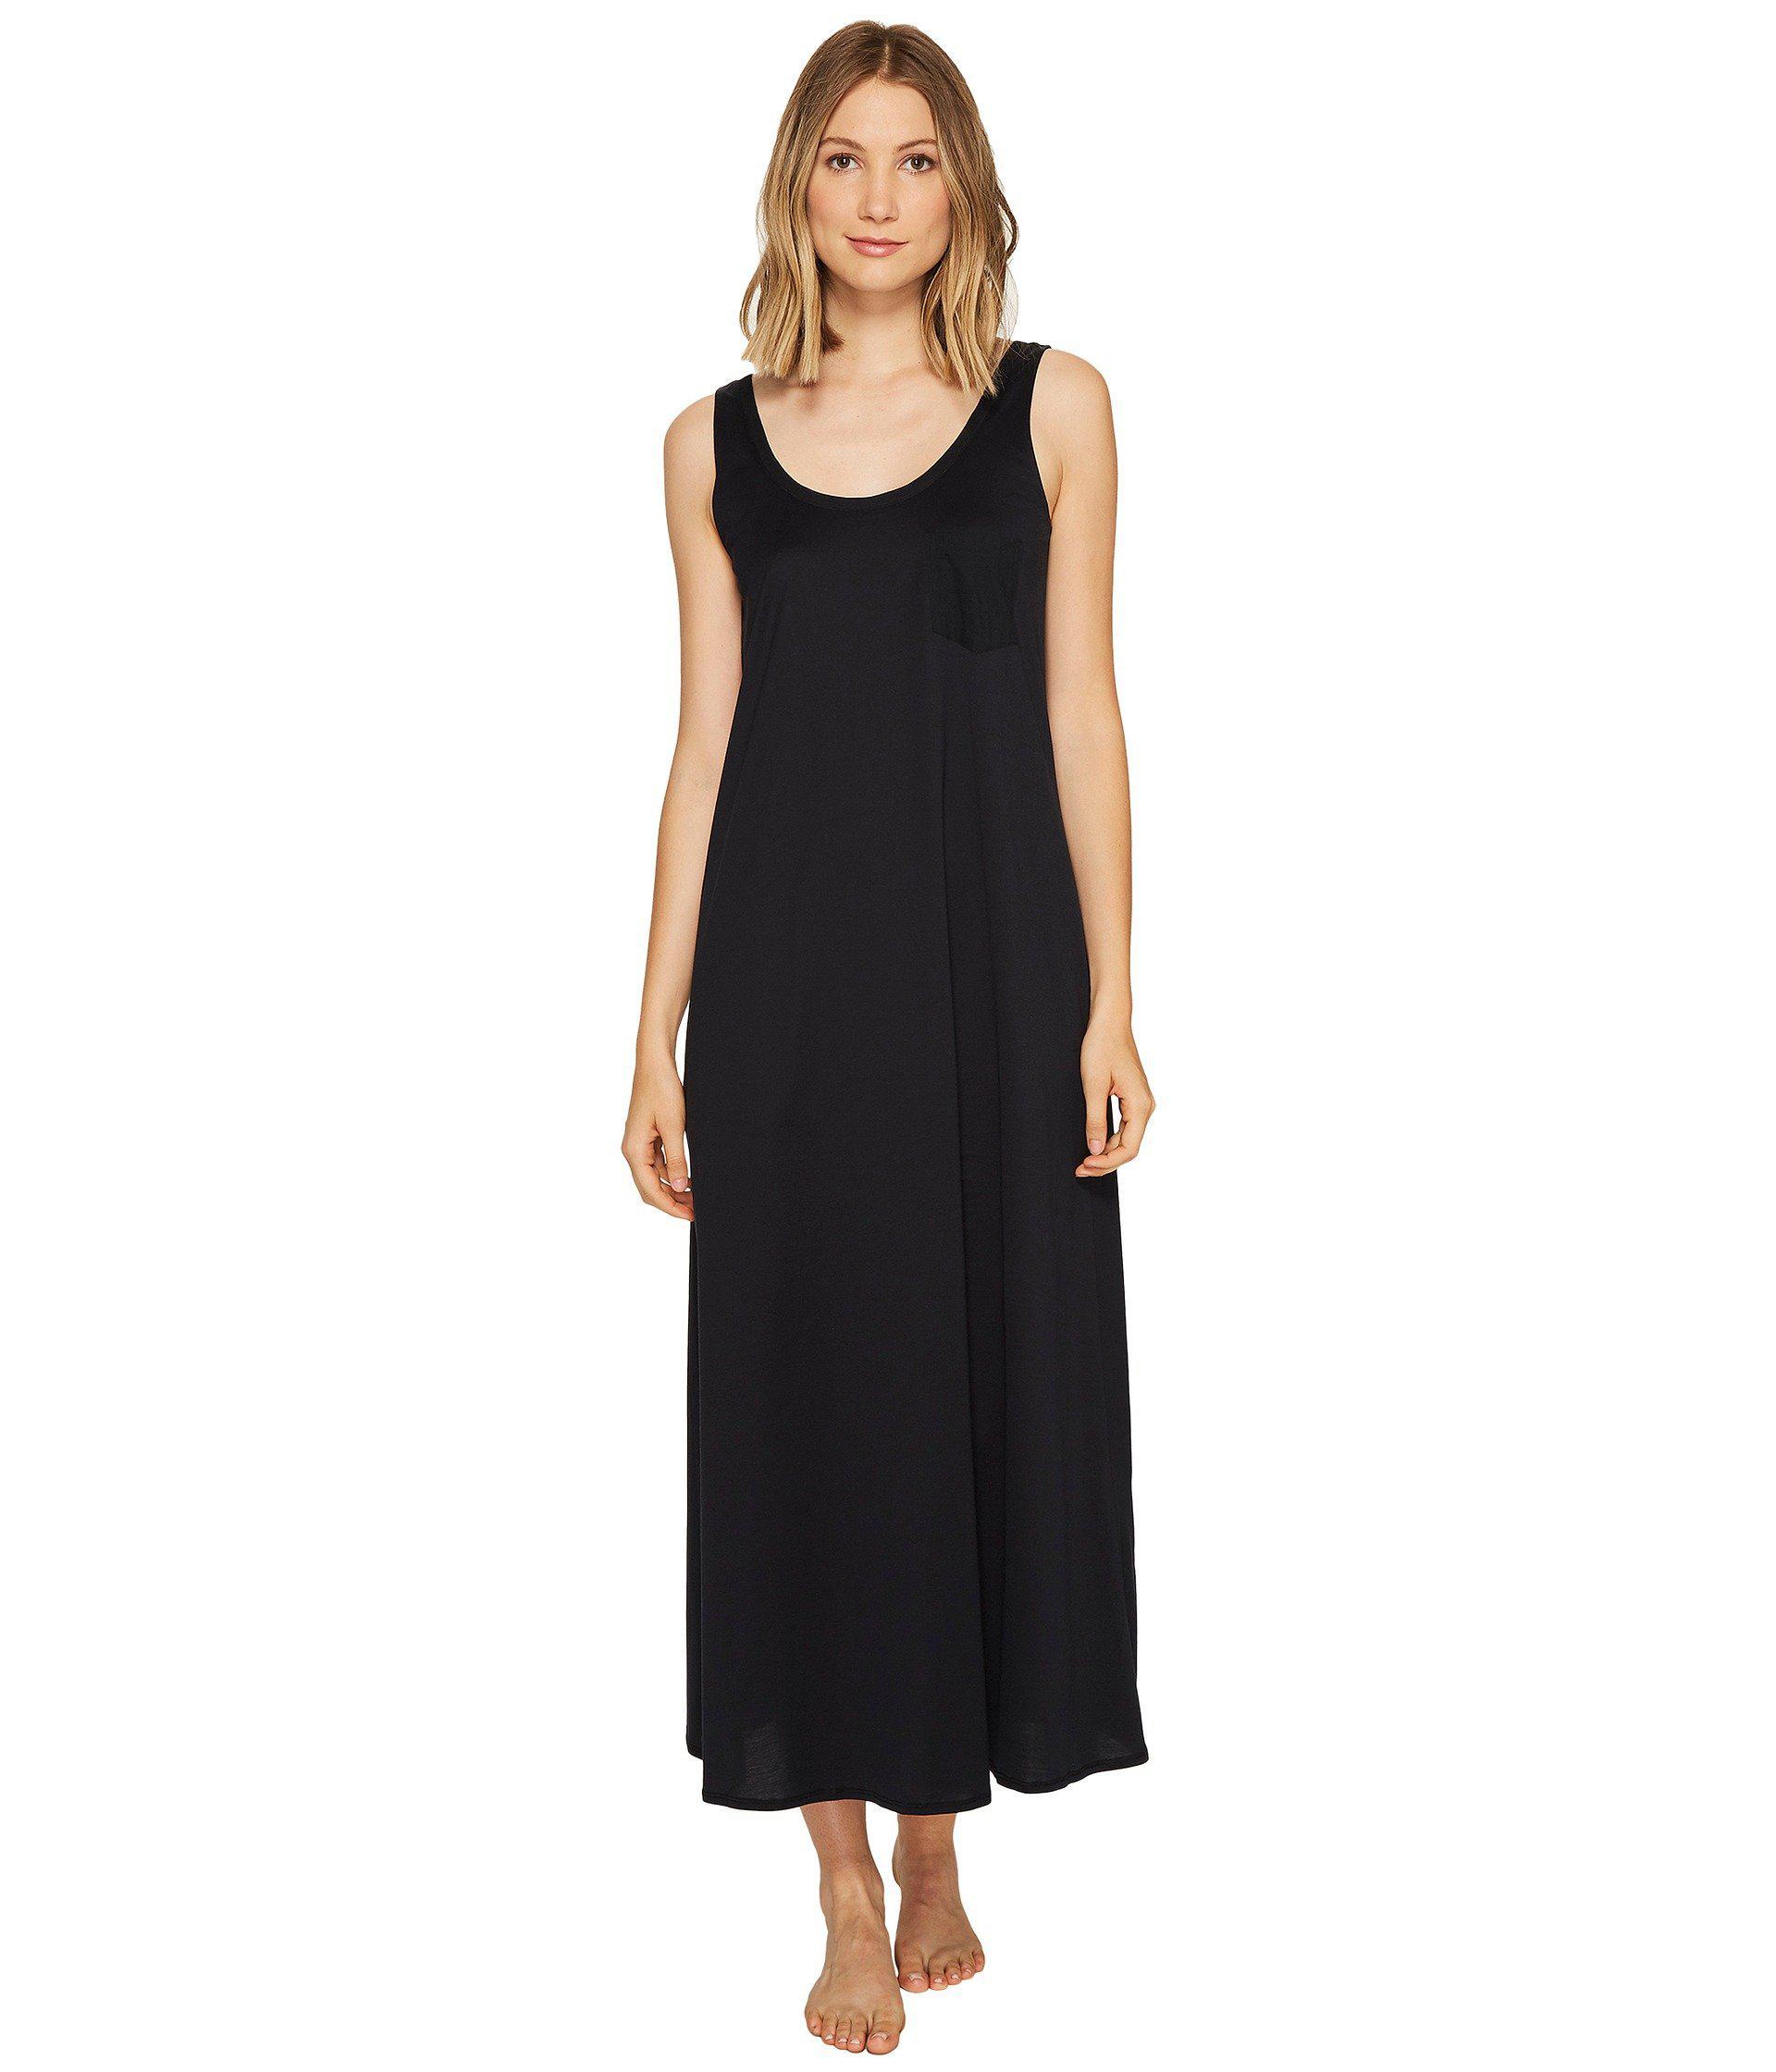 1ff3bf45fc Lyst - Hanro Cotton Deluxe Long Tank Nightgown (black) Women s ...